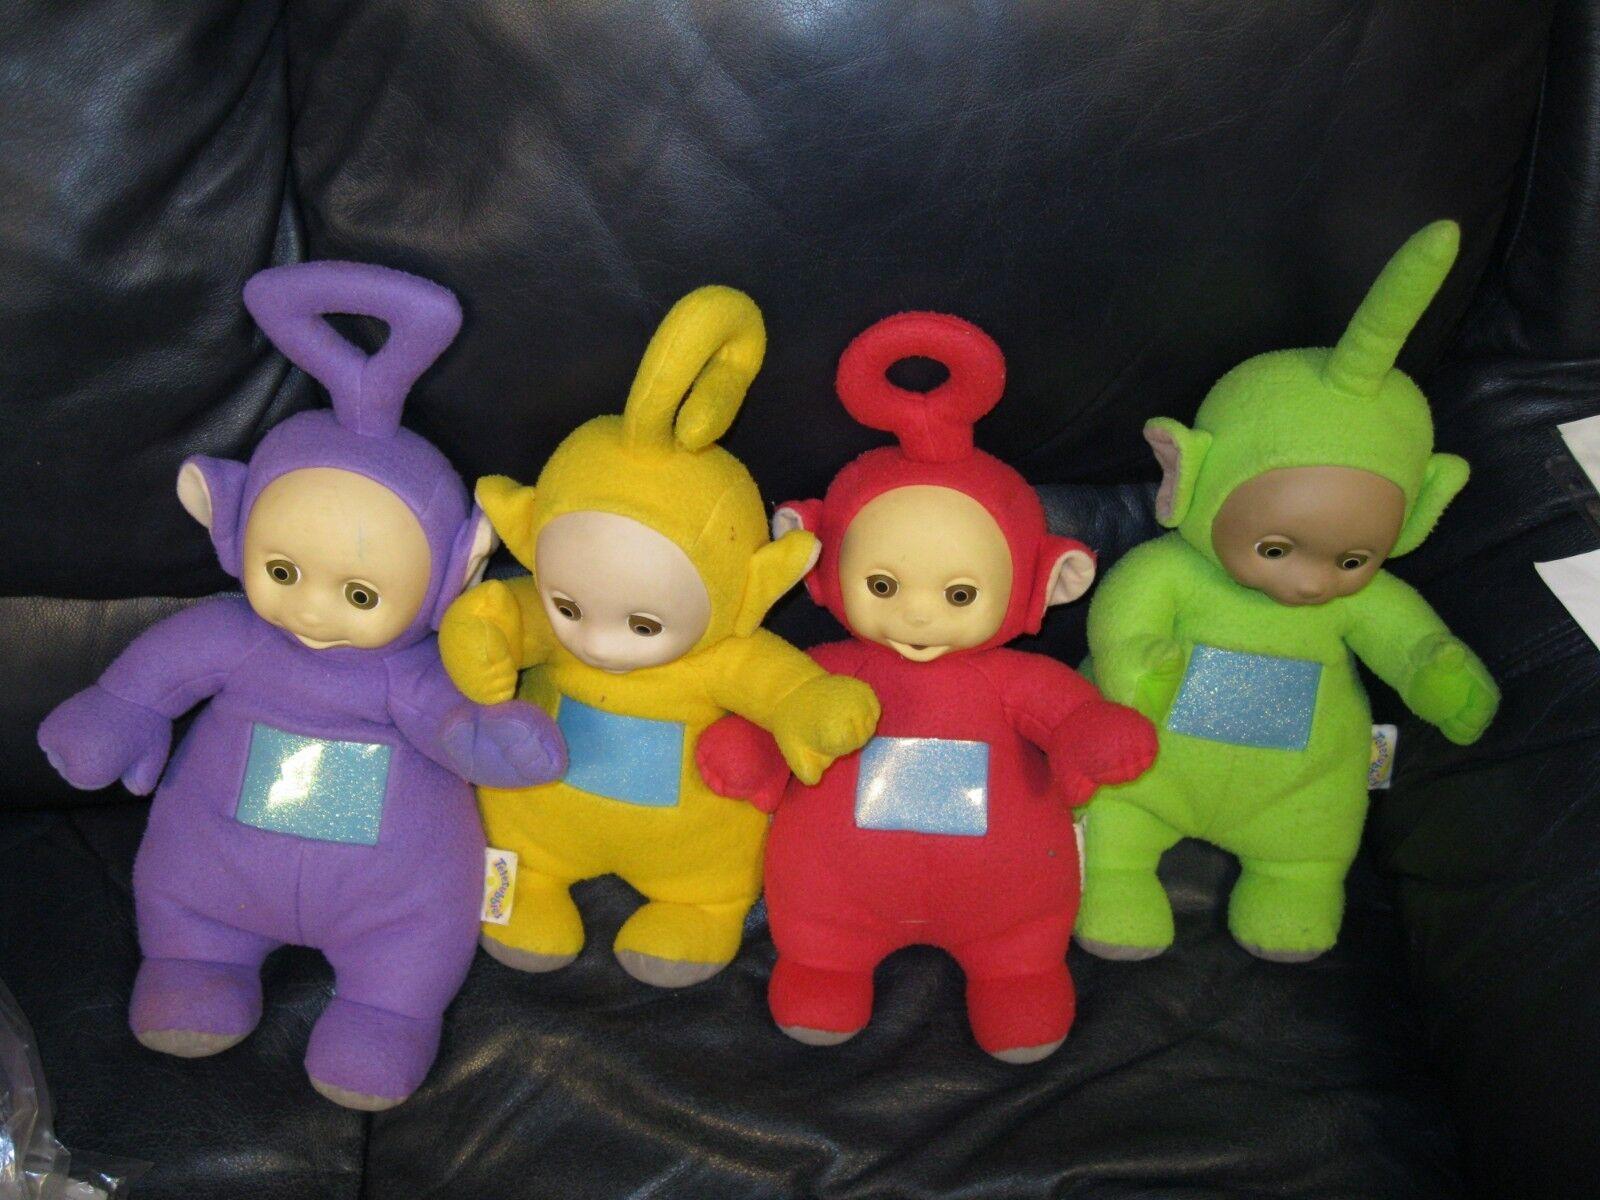 Teletubbies Po, Dipsy, Laa Laa, And Tinky Winky Plush Dolls Set 4